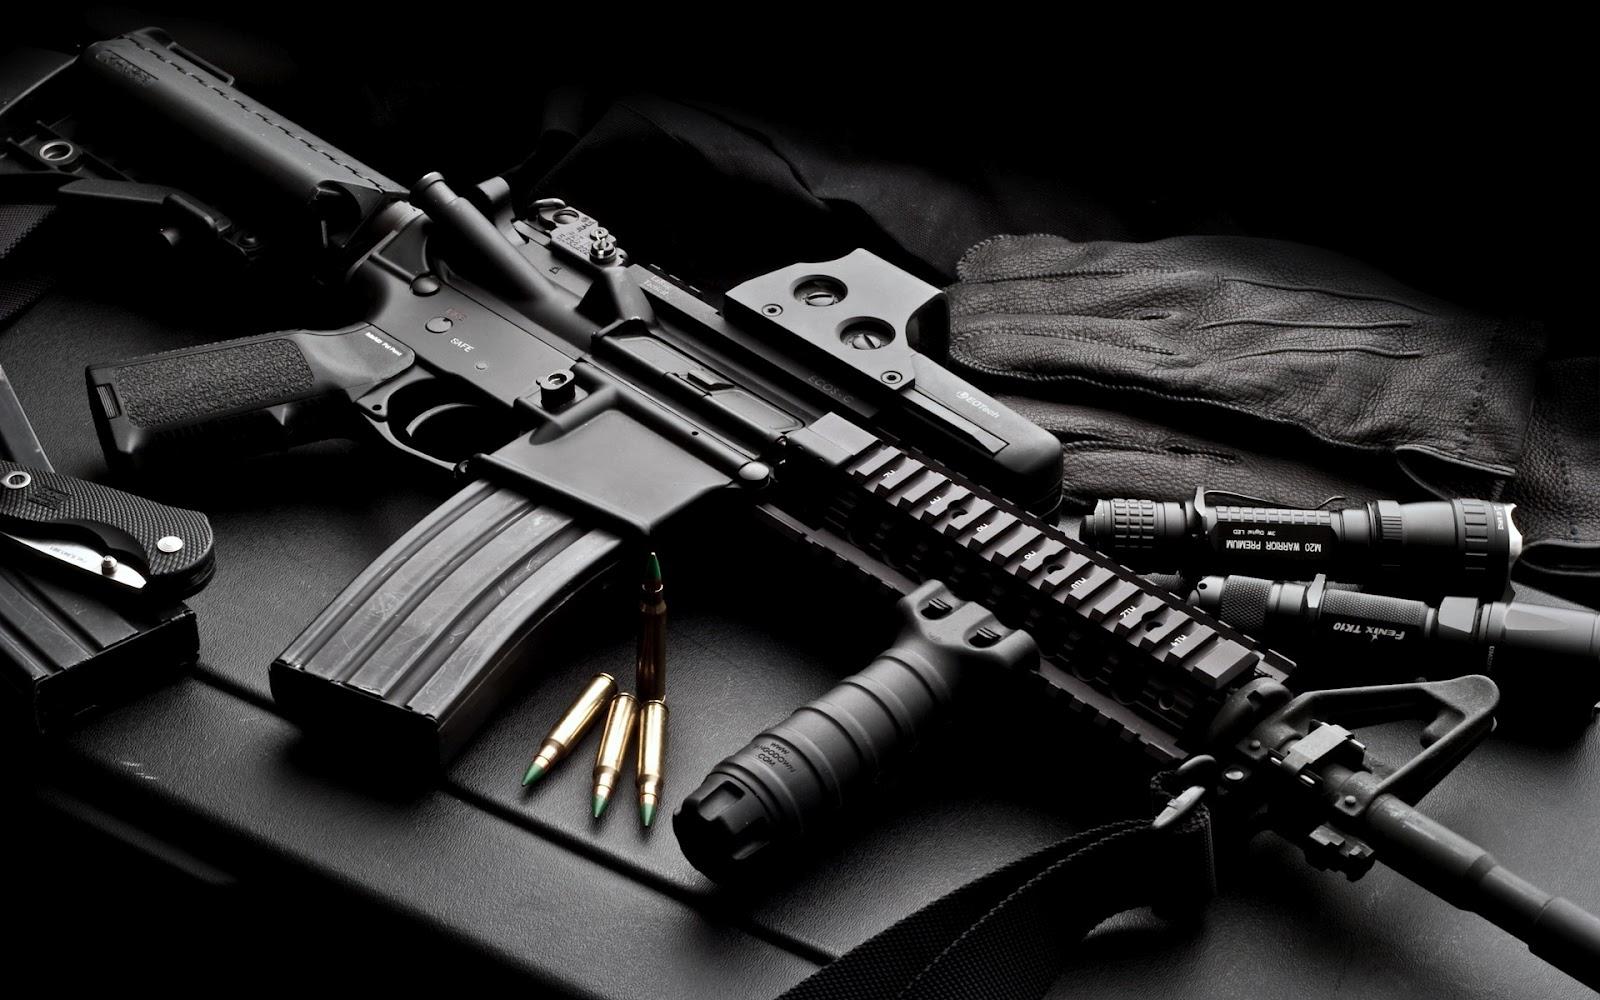 guns background hd - photo #4